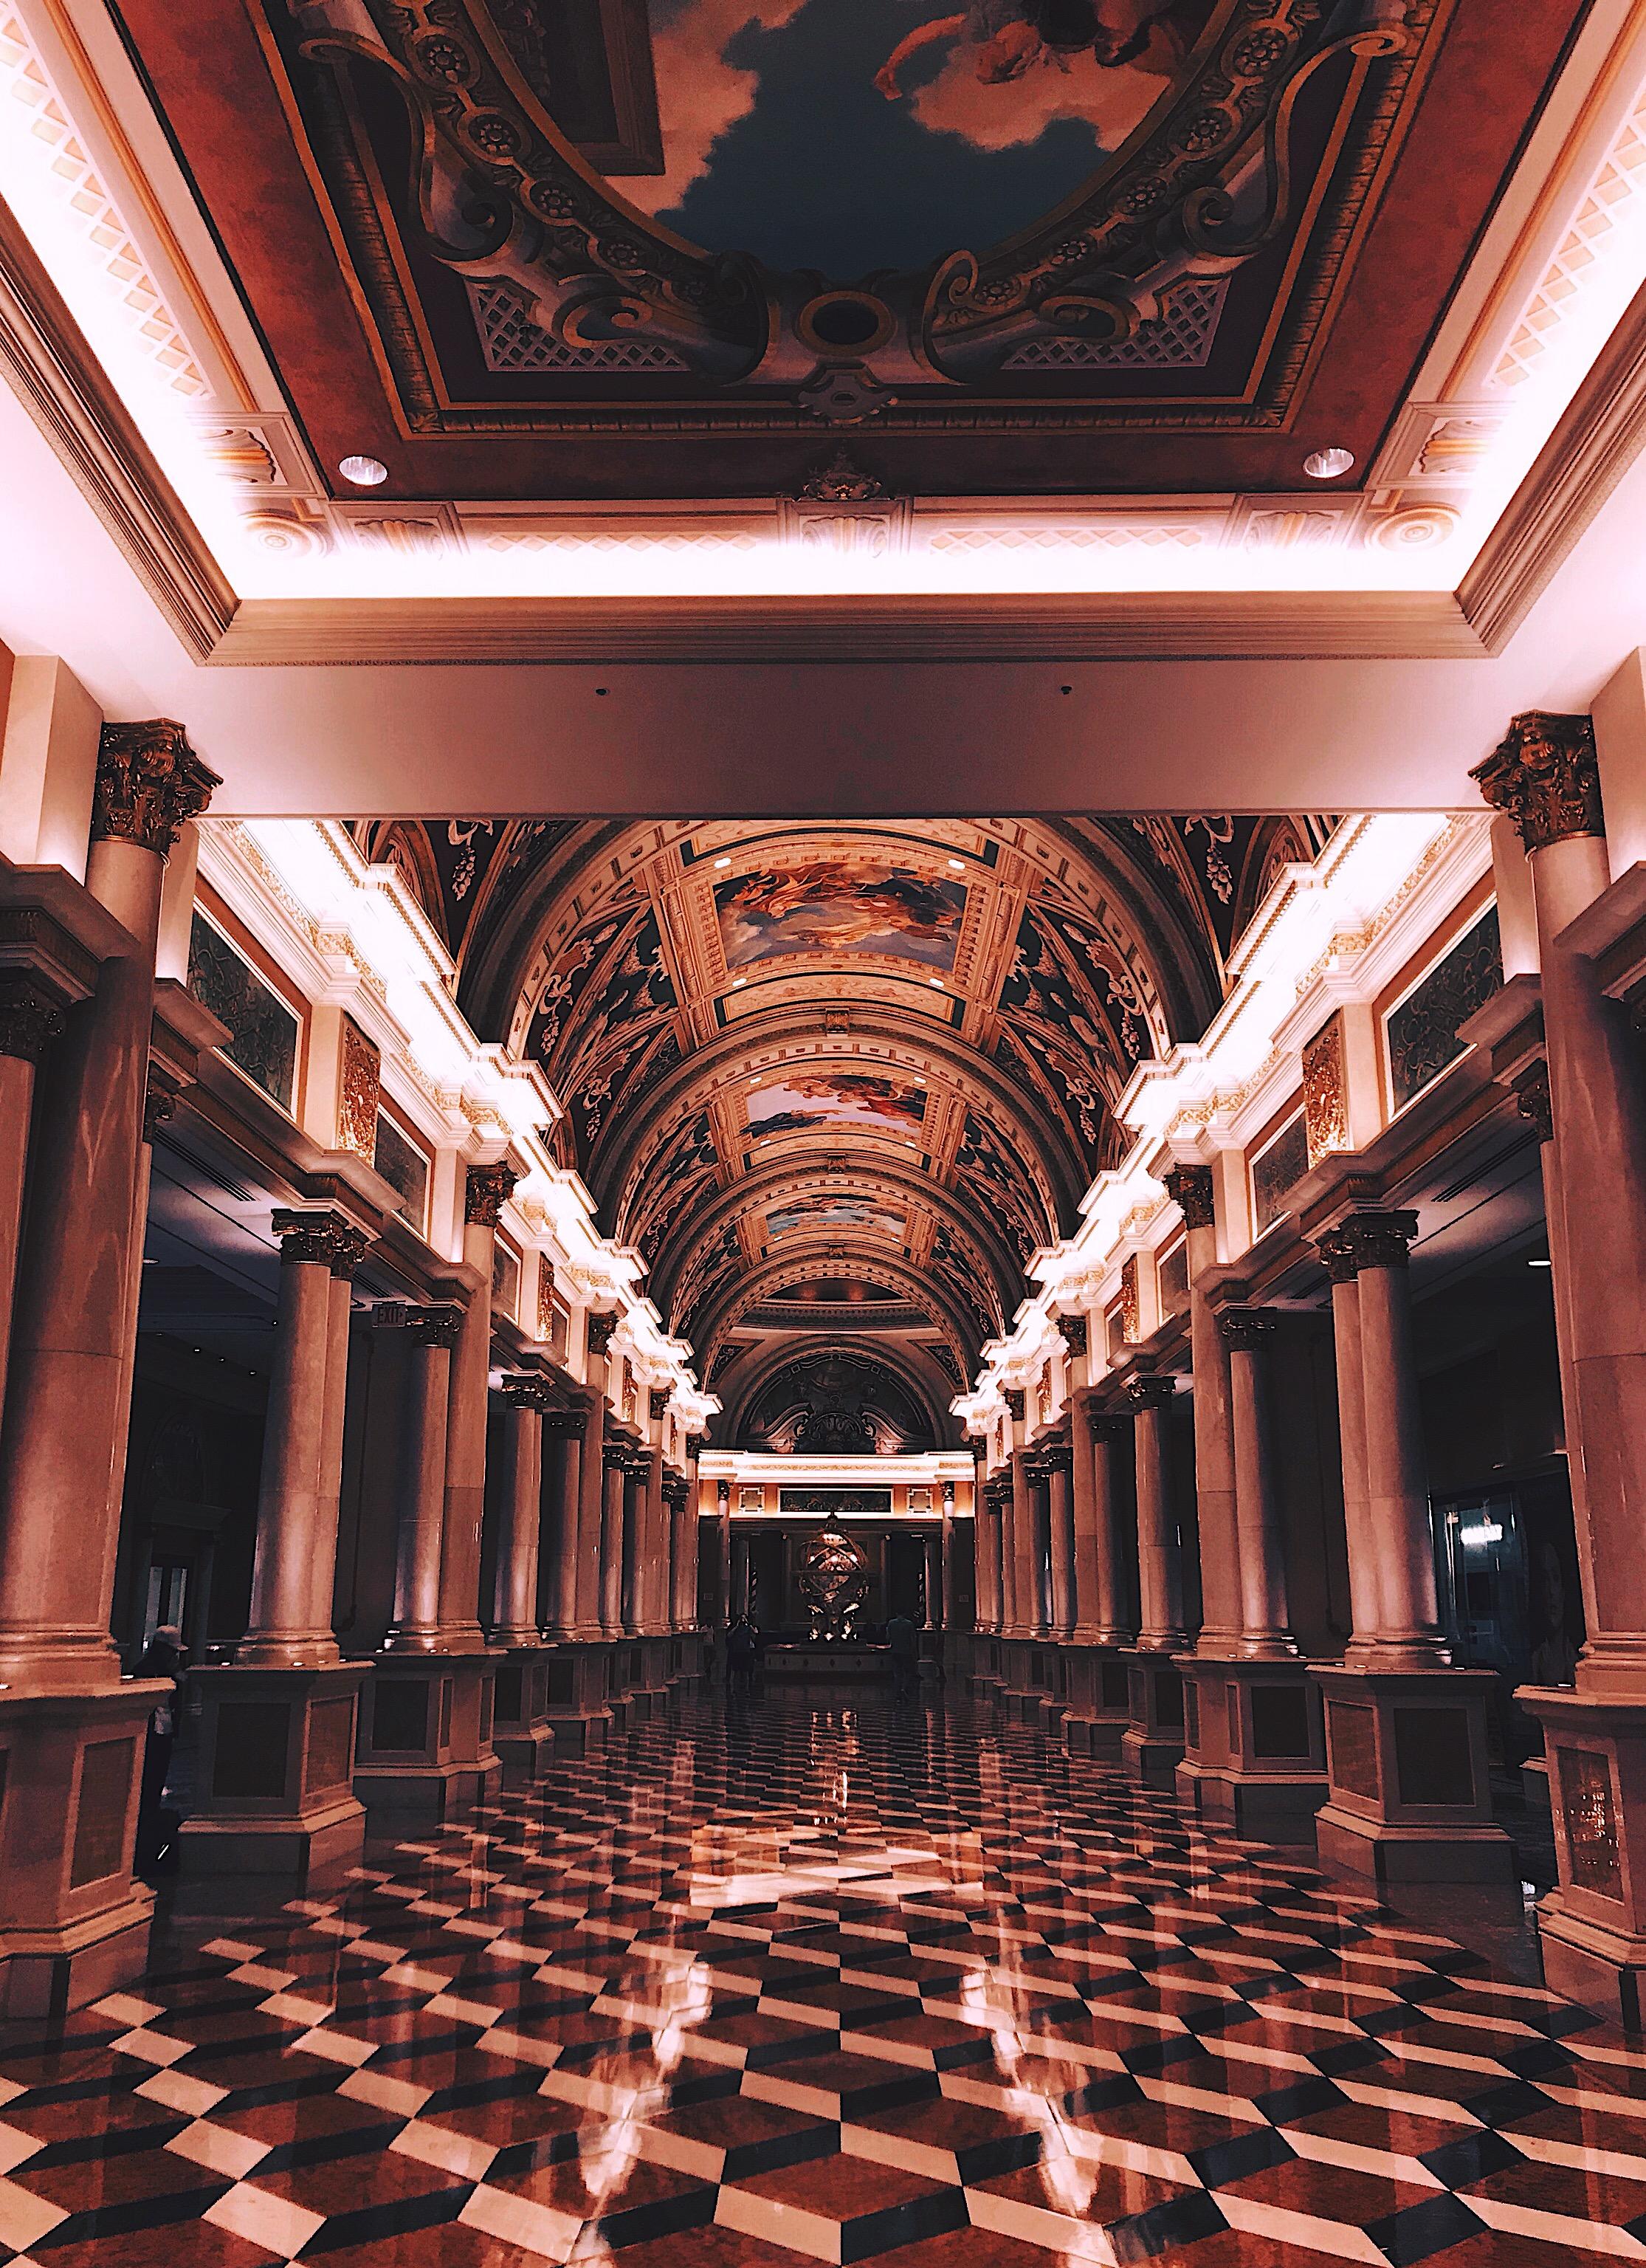 Las Vegas The Venetian Hotel hallway Style Unsettled